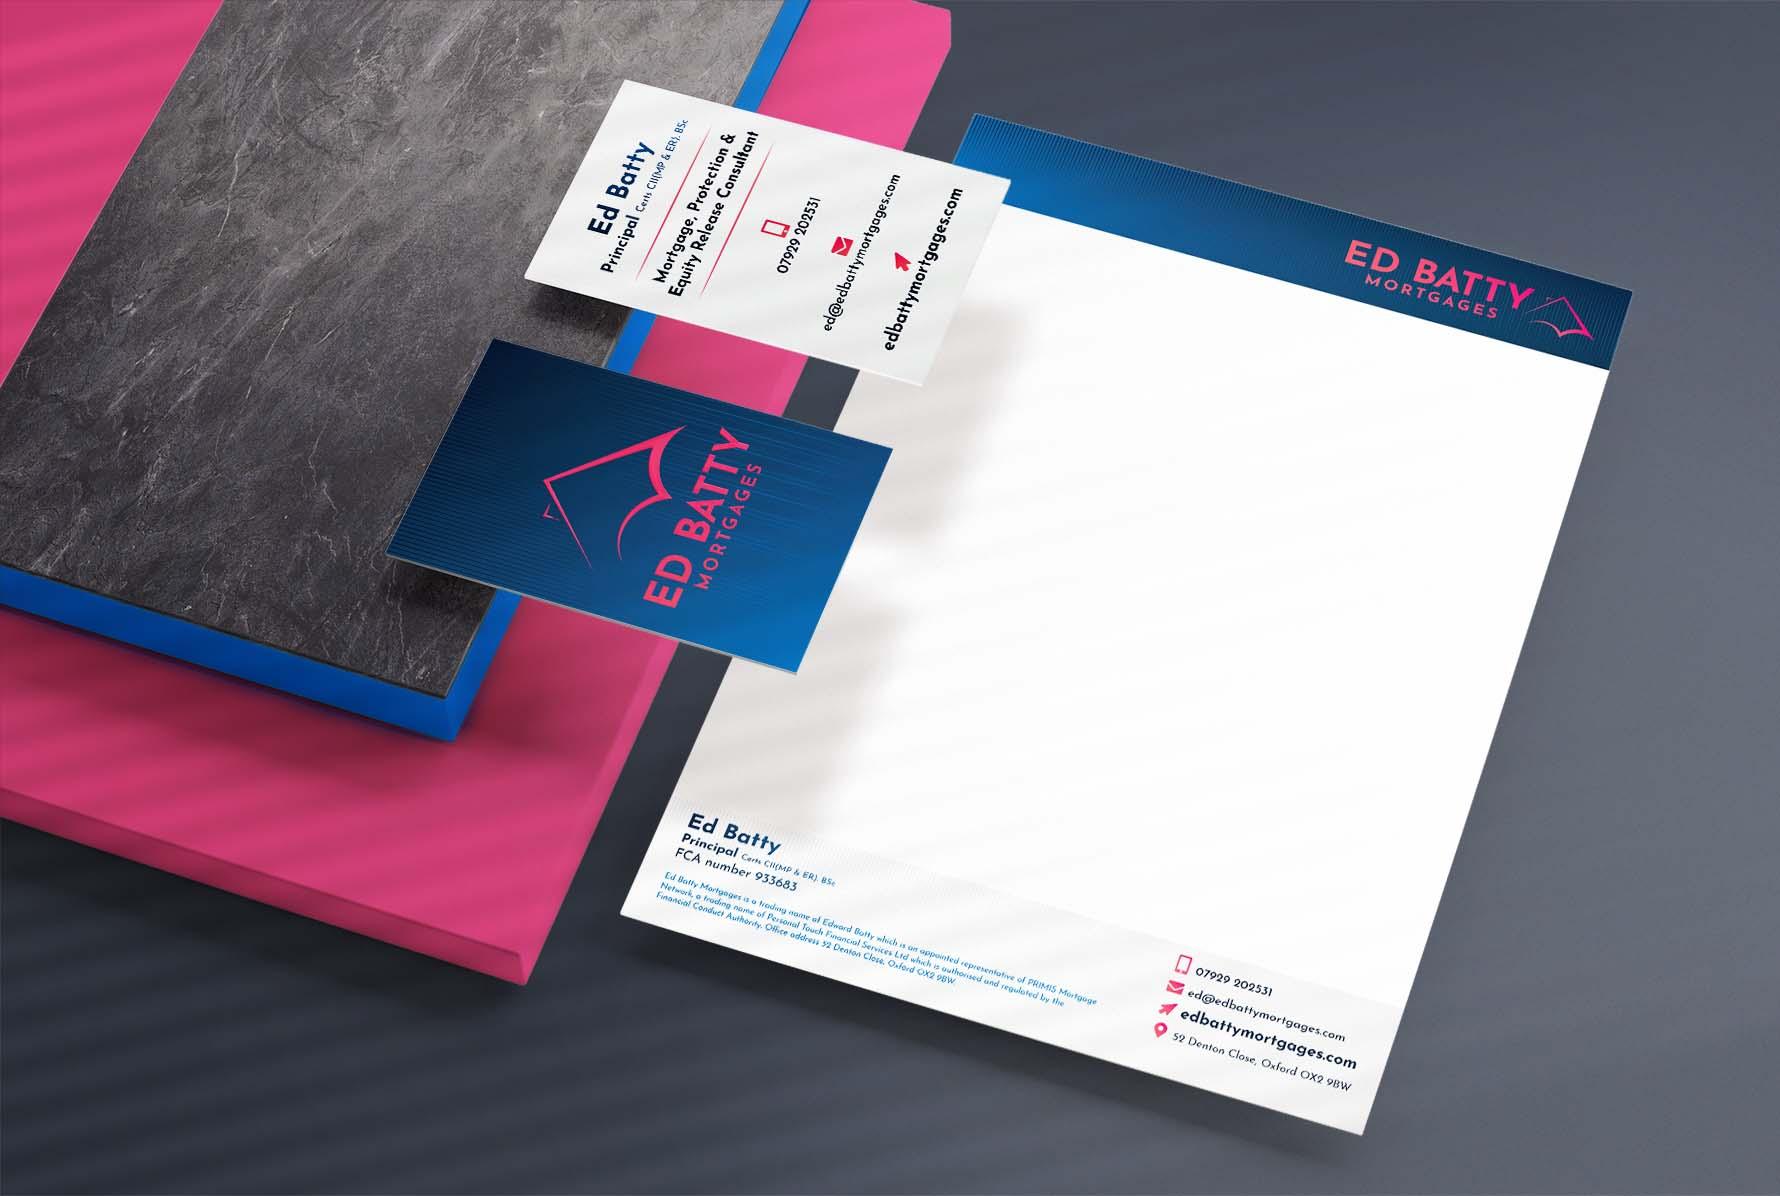 Ed Batty Mortgage Branding Stationery Design & Branding